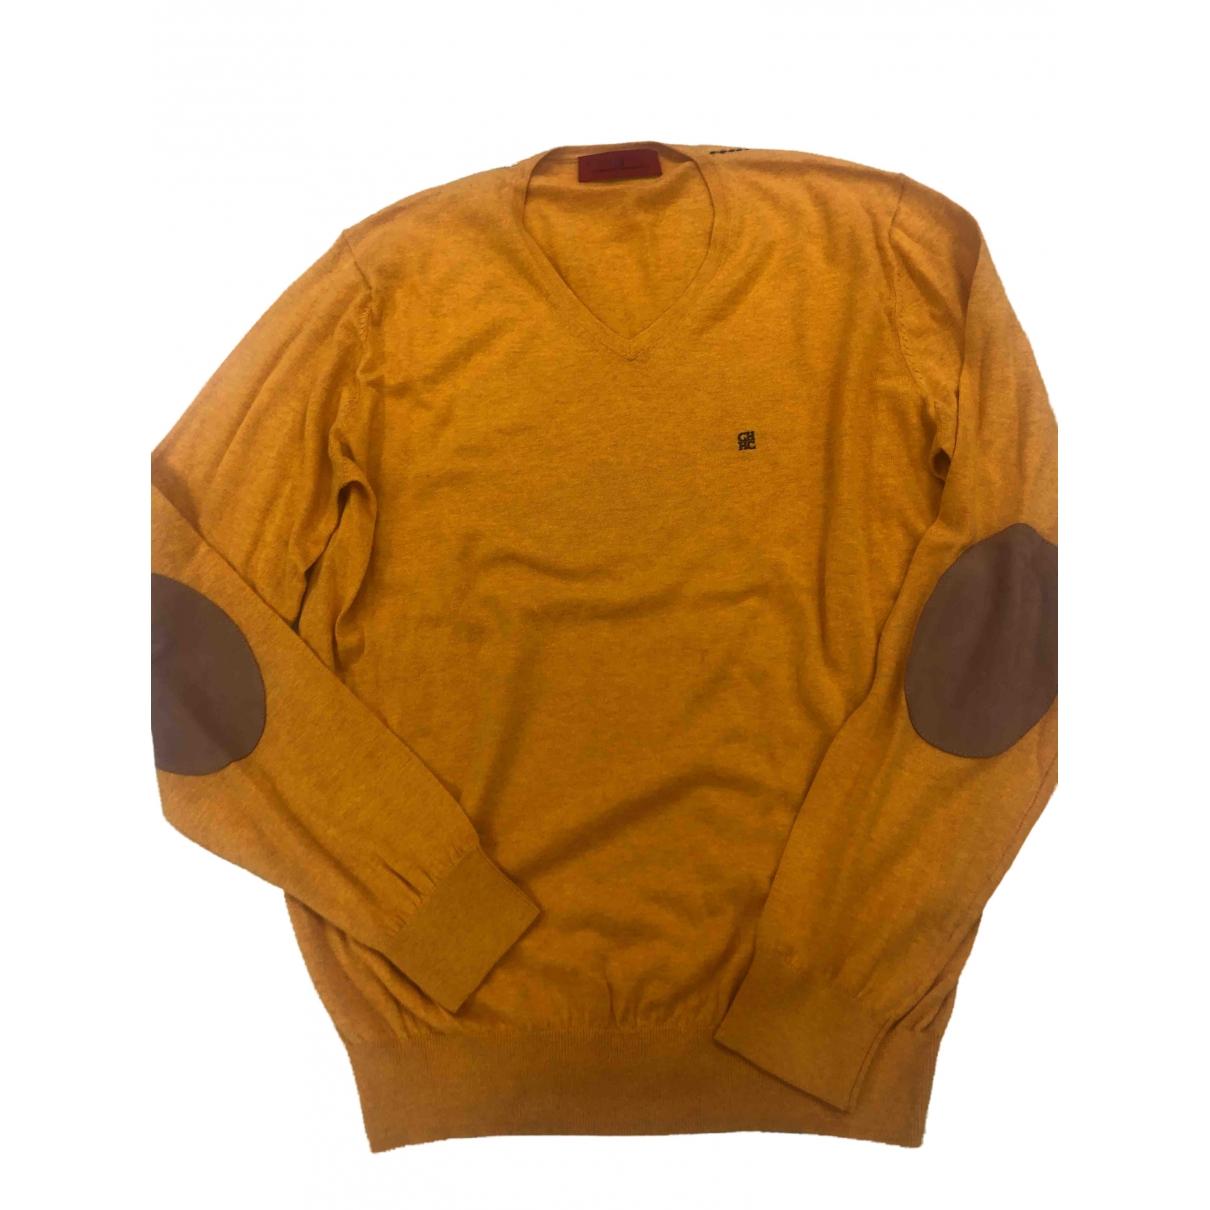 Carolina Herrera - Pulls.Gilets.Sweats   pour homme en coton - jaune